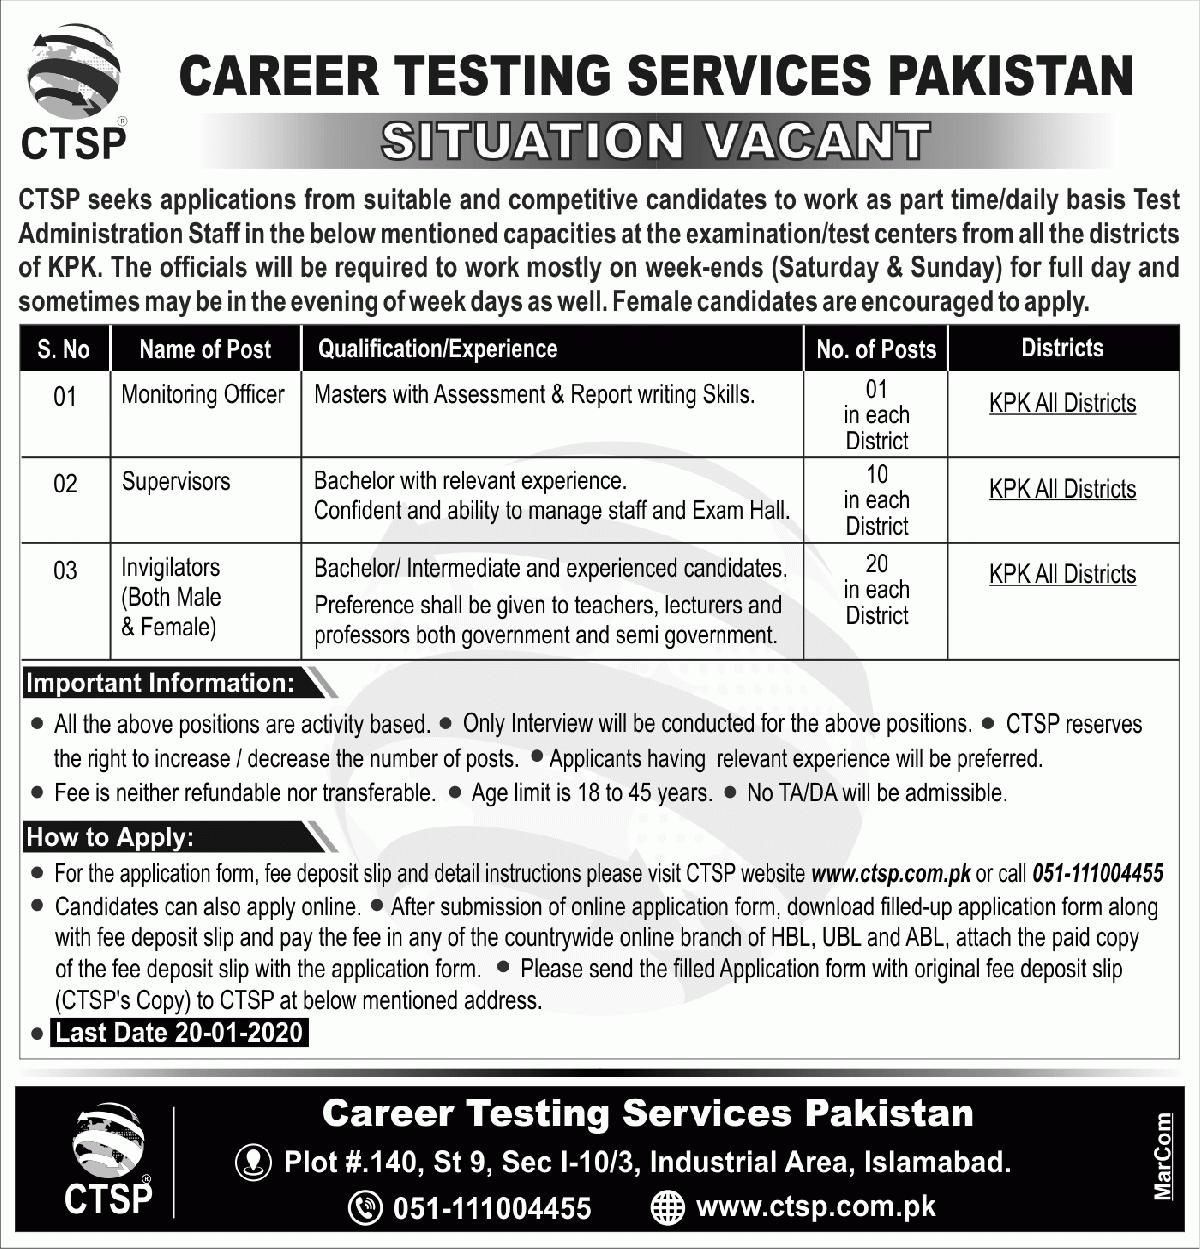 Career Testing Services Pakistan (CTSP) Jobs 2020 for Invigilators, Supervisors & Monitoring Officers Latest